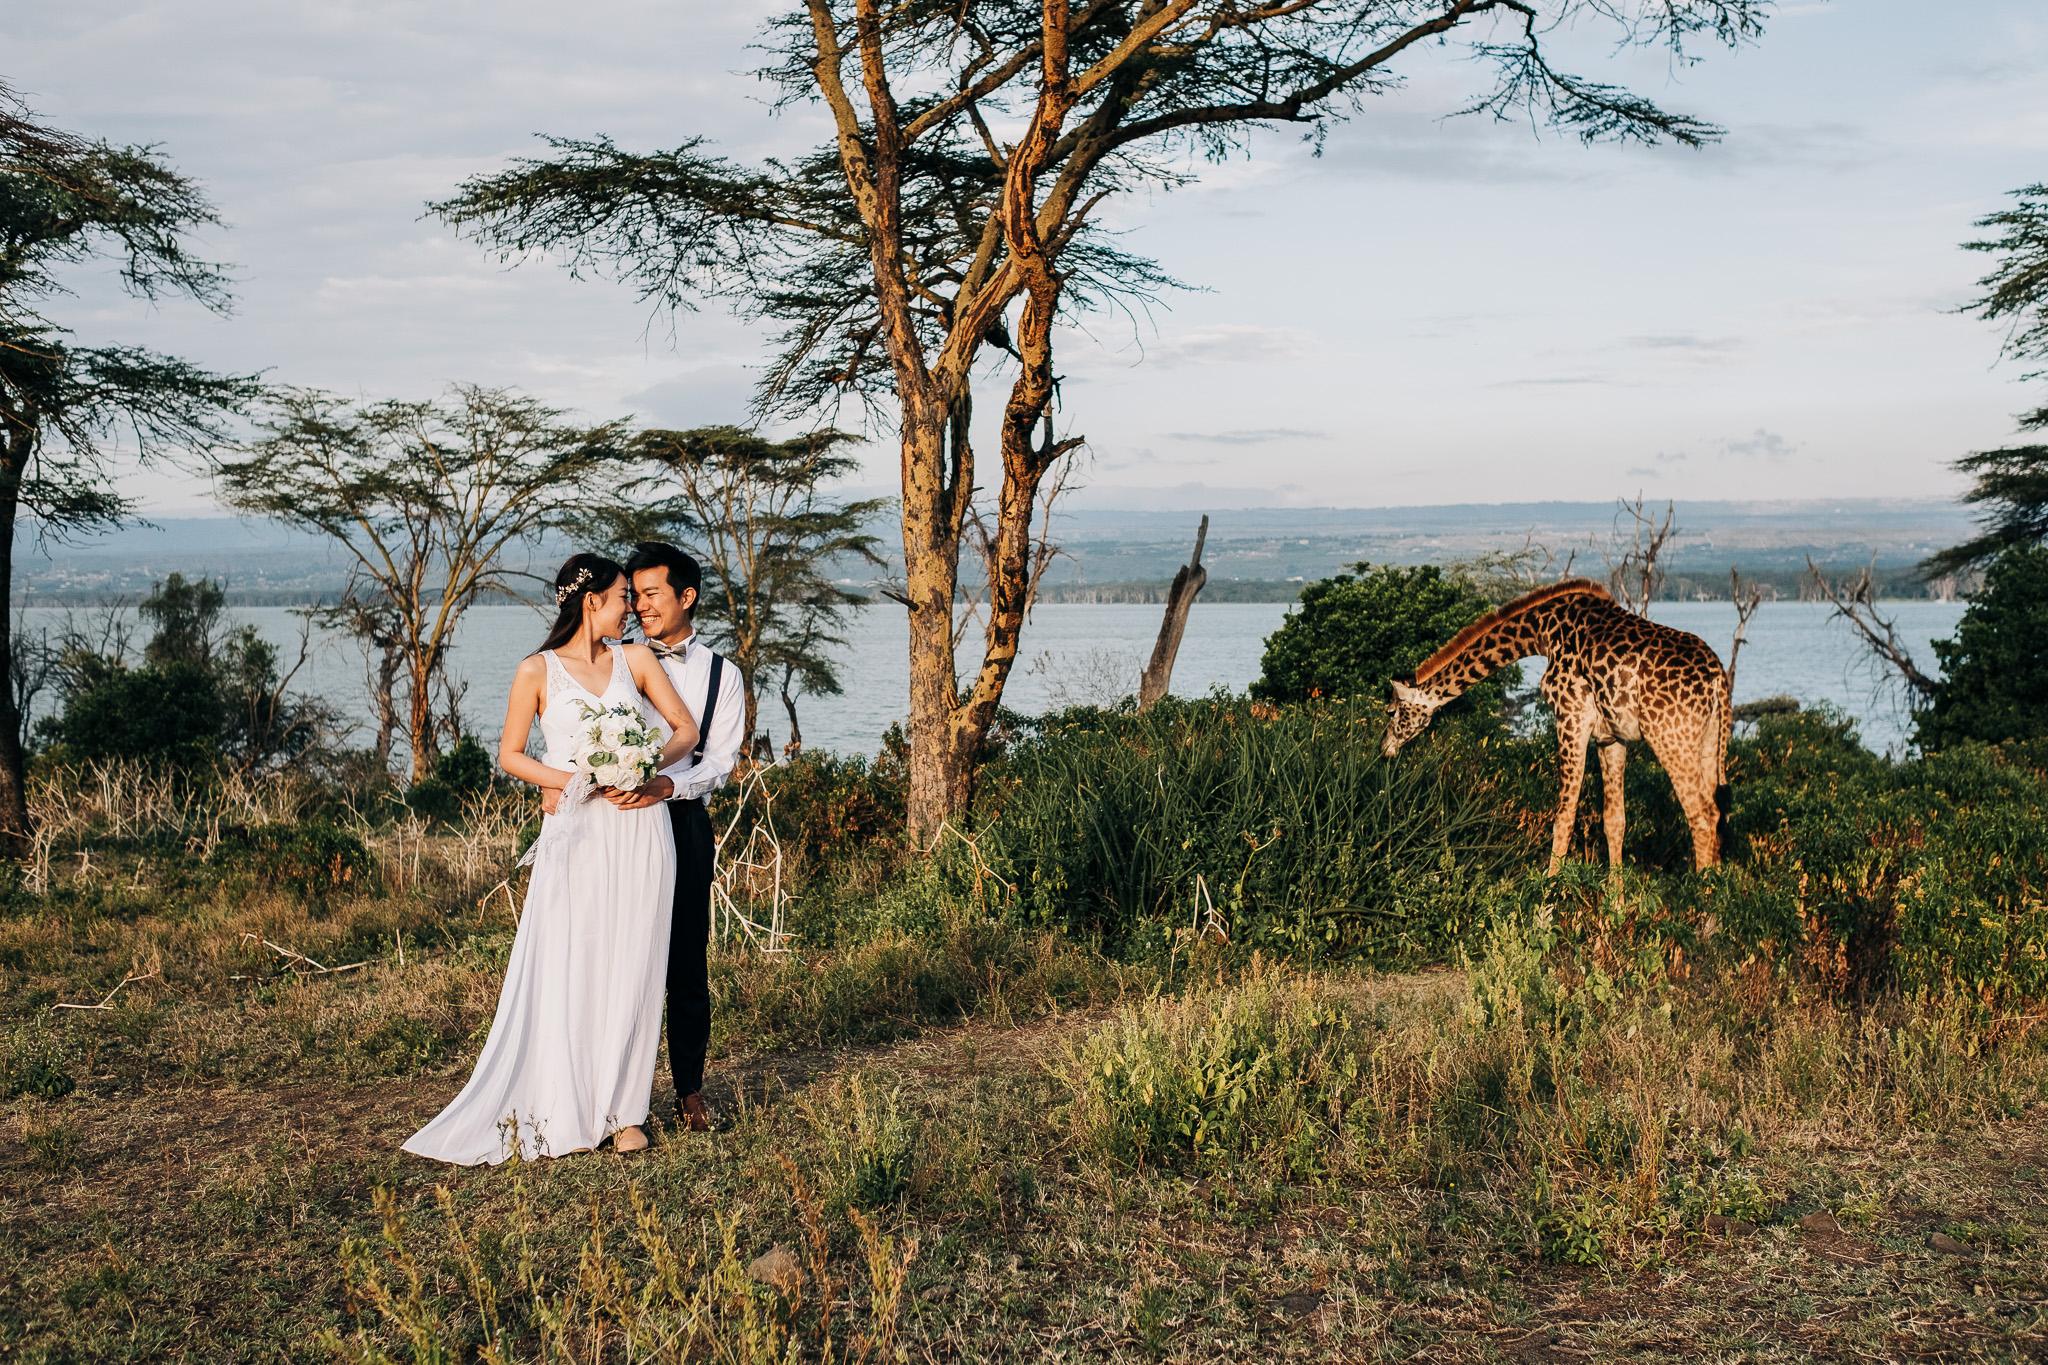 Anna-Hari-Photography-Safari-Elopement-Kenya-Wedding-Photographer-Kenya-82.jpg